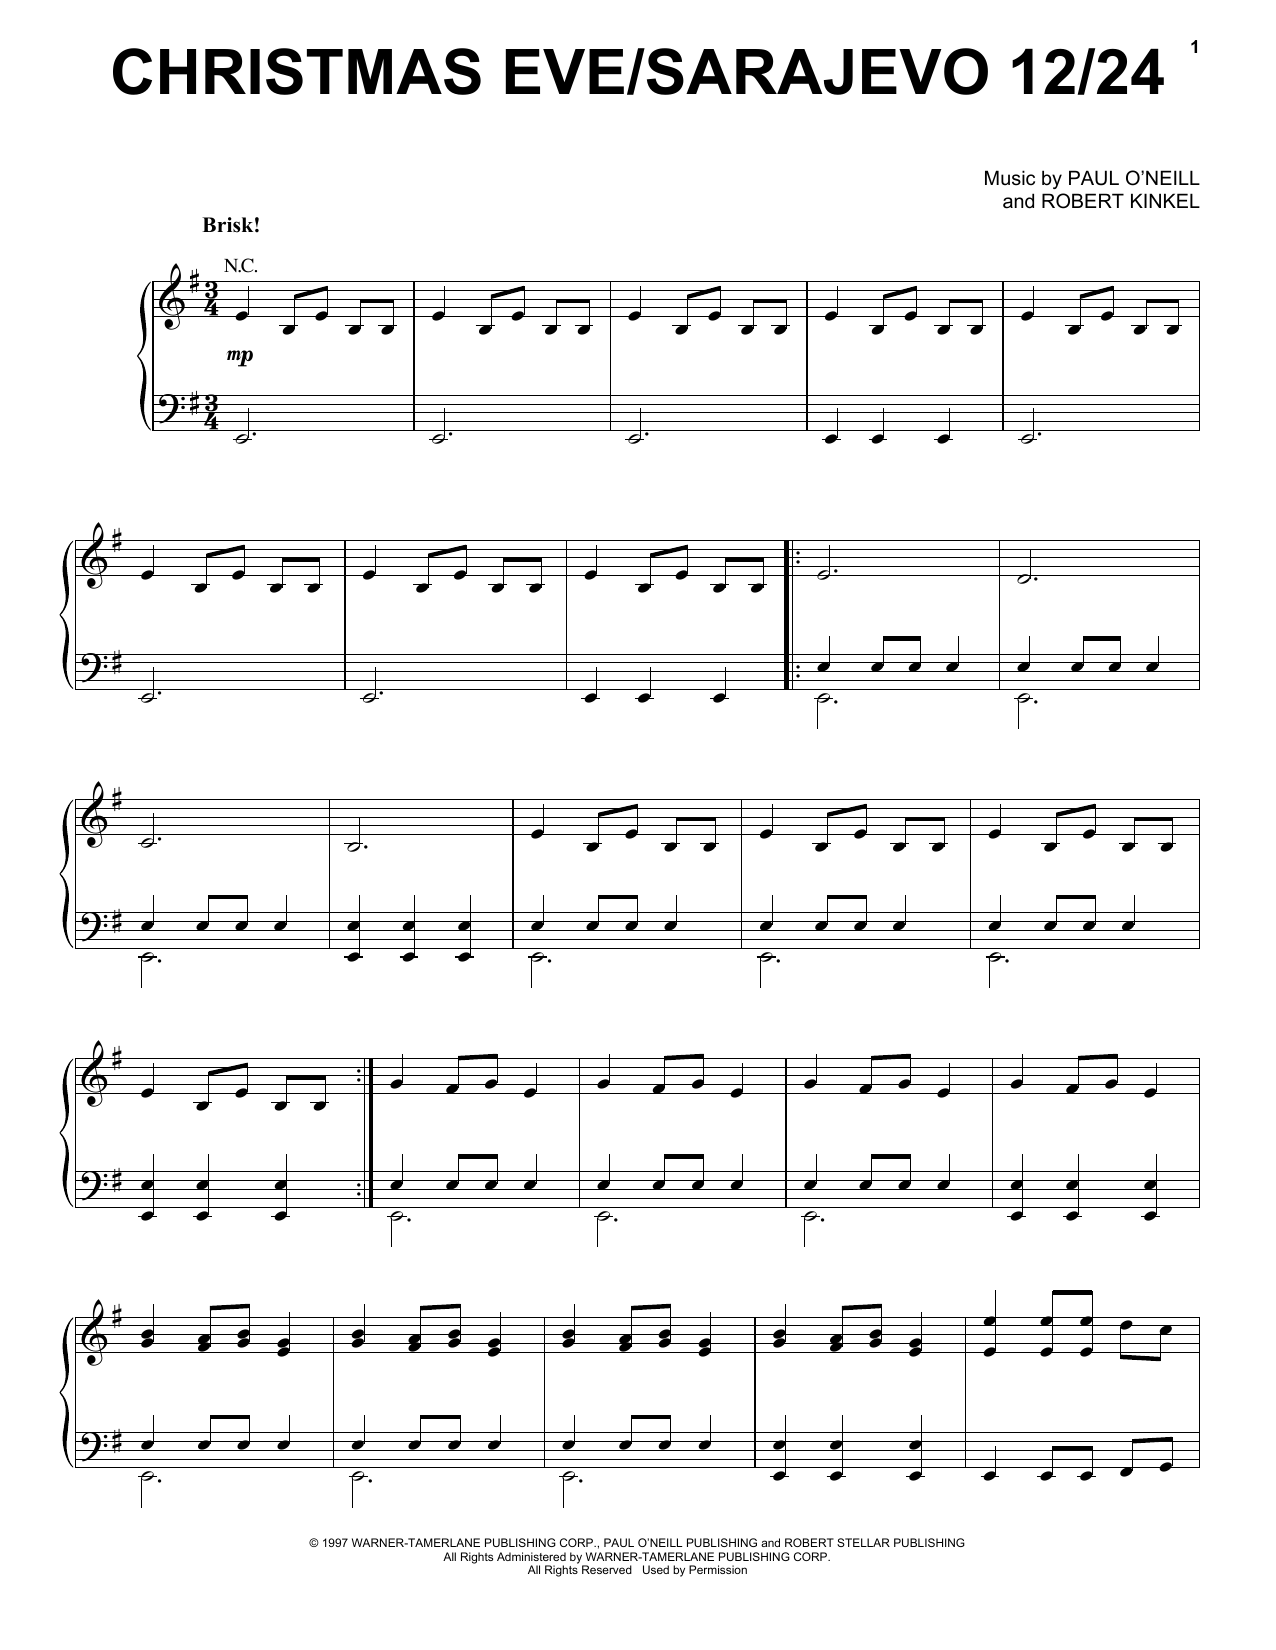 Davidcrowder Band Christmas Evesarajevo 1224 Sheet Music Notes